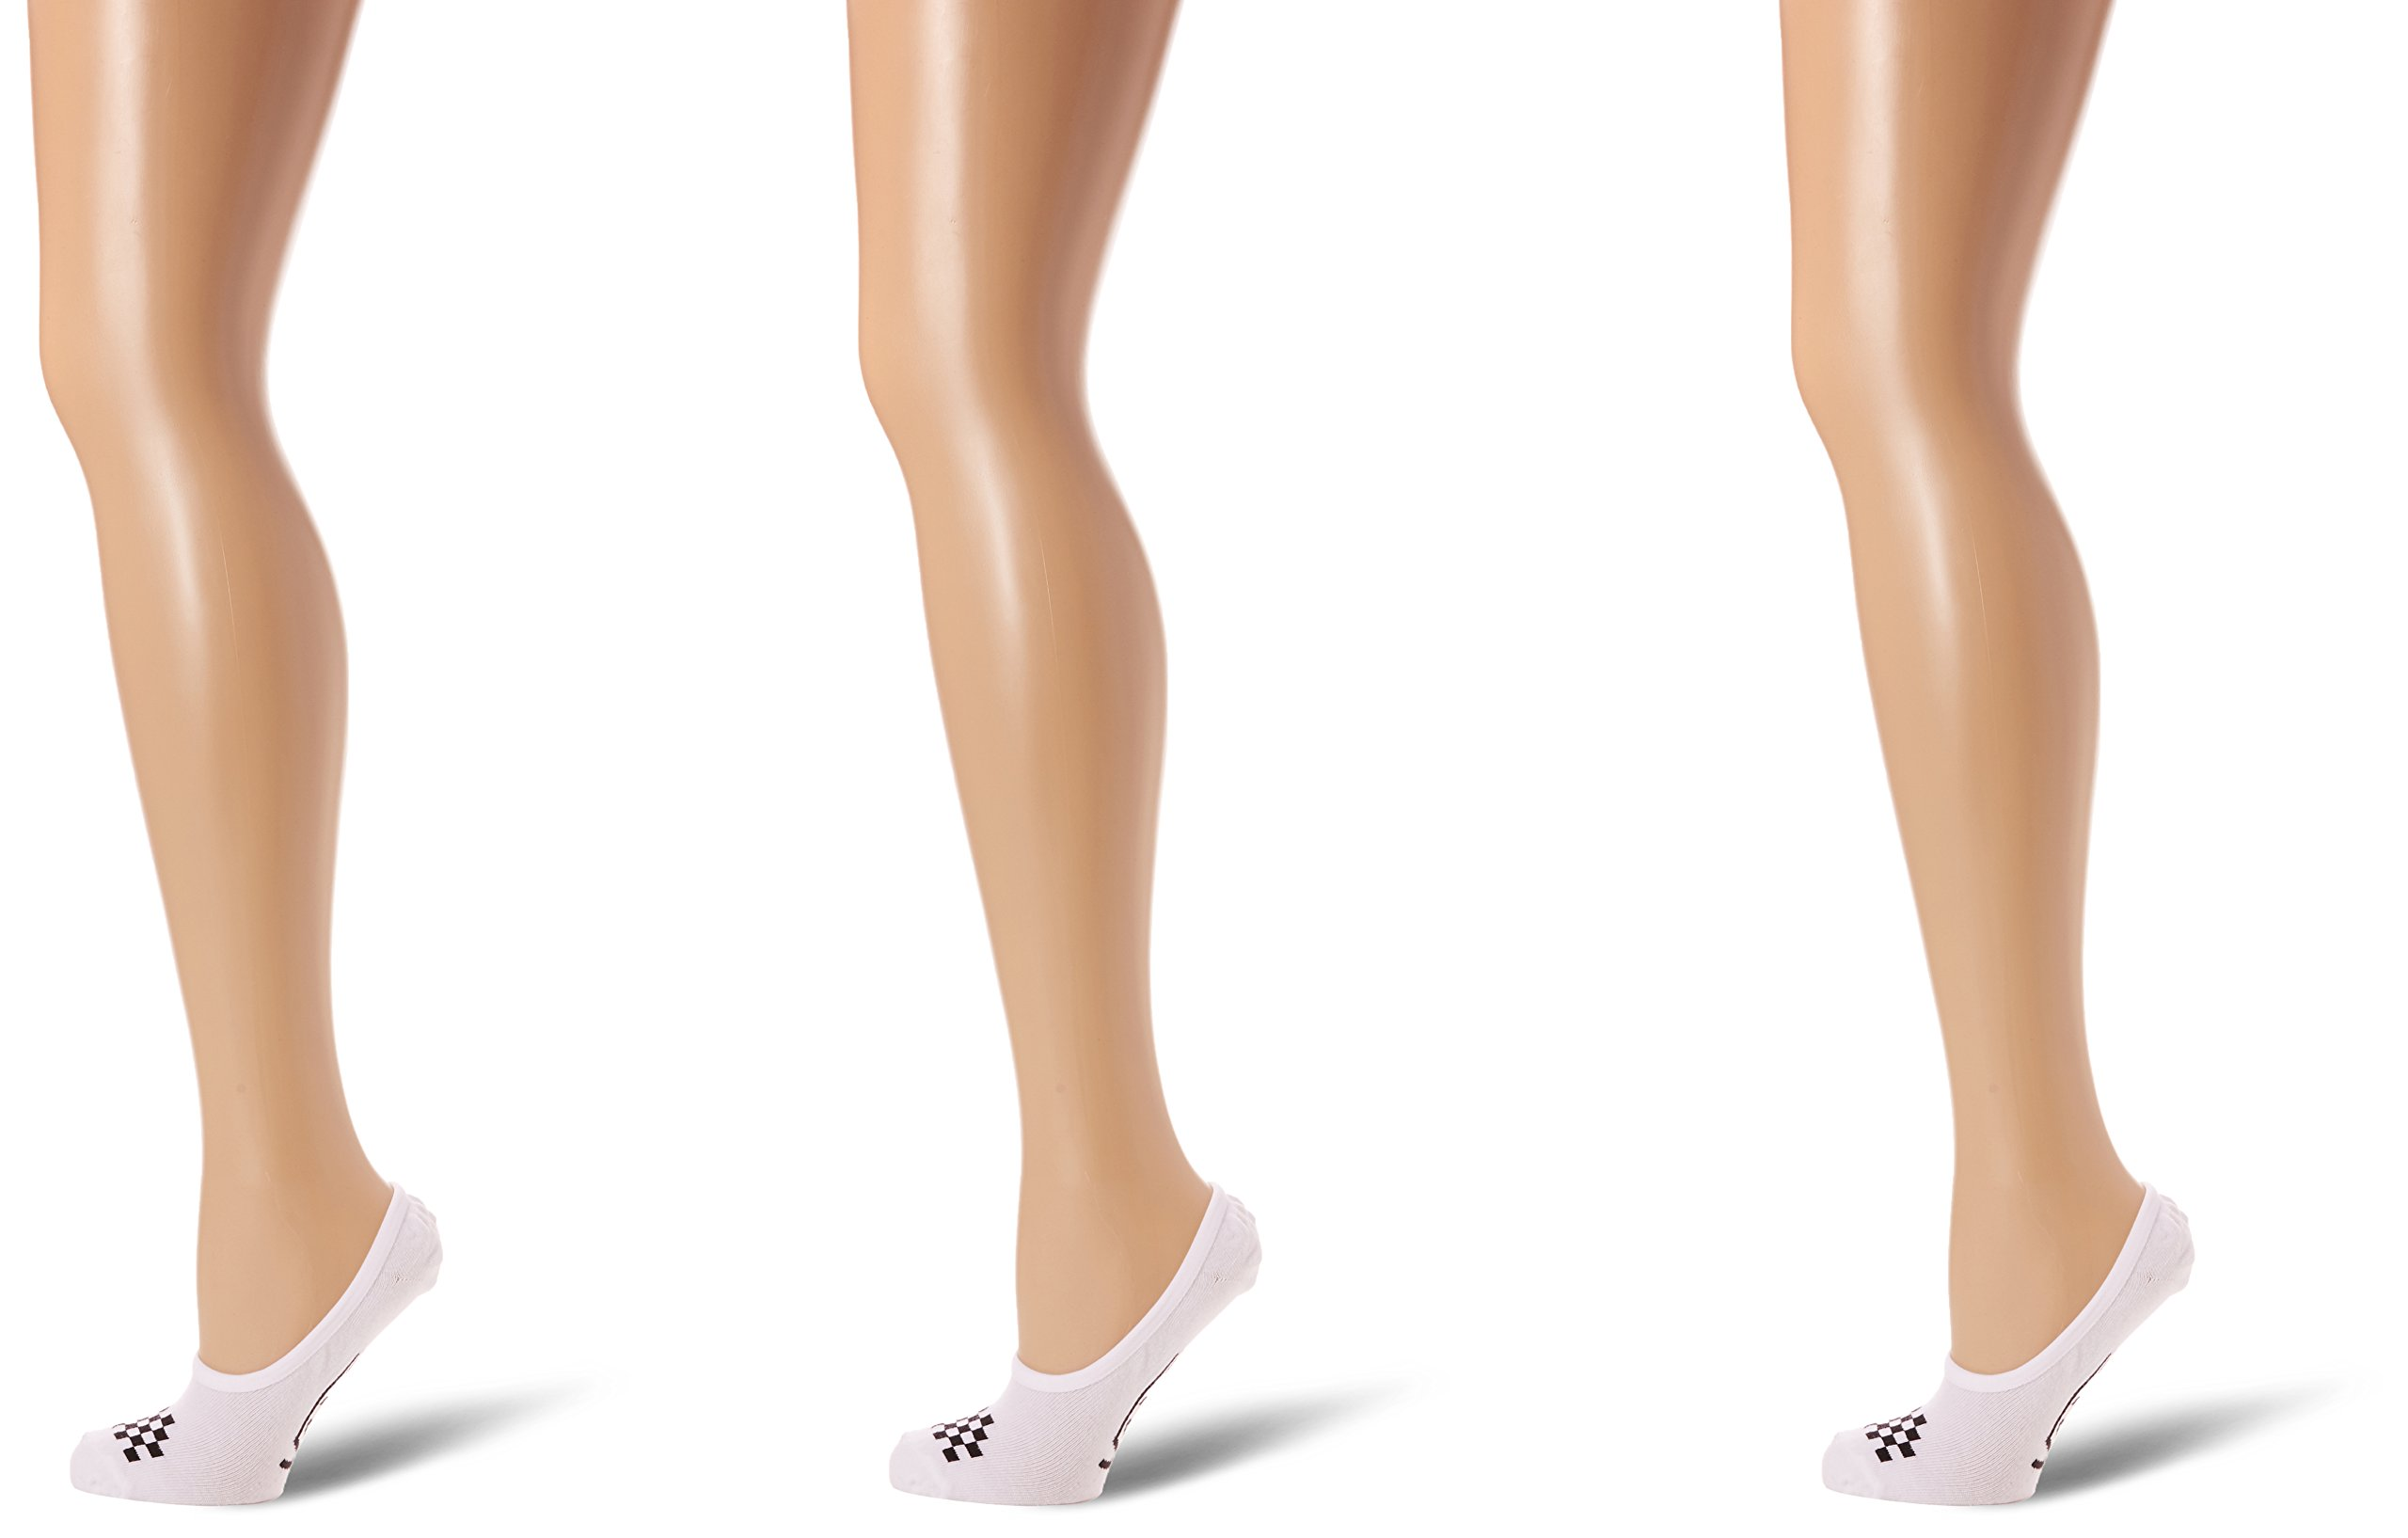 Vans Womens Socks No Show 3 Pair White Socks Size 7-10